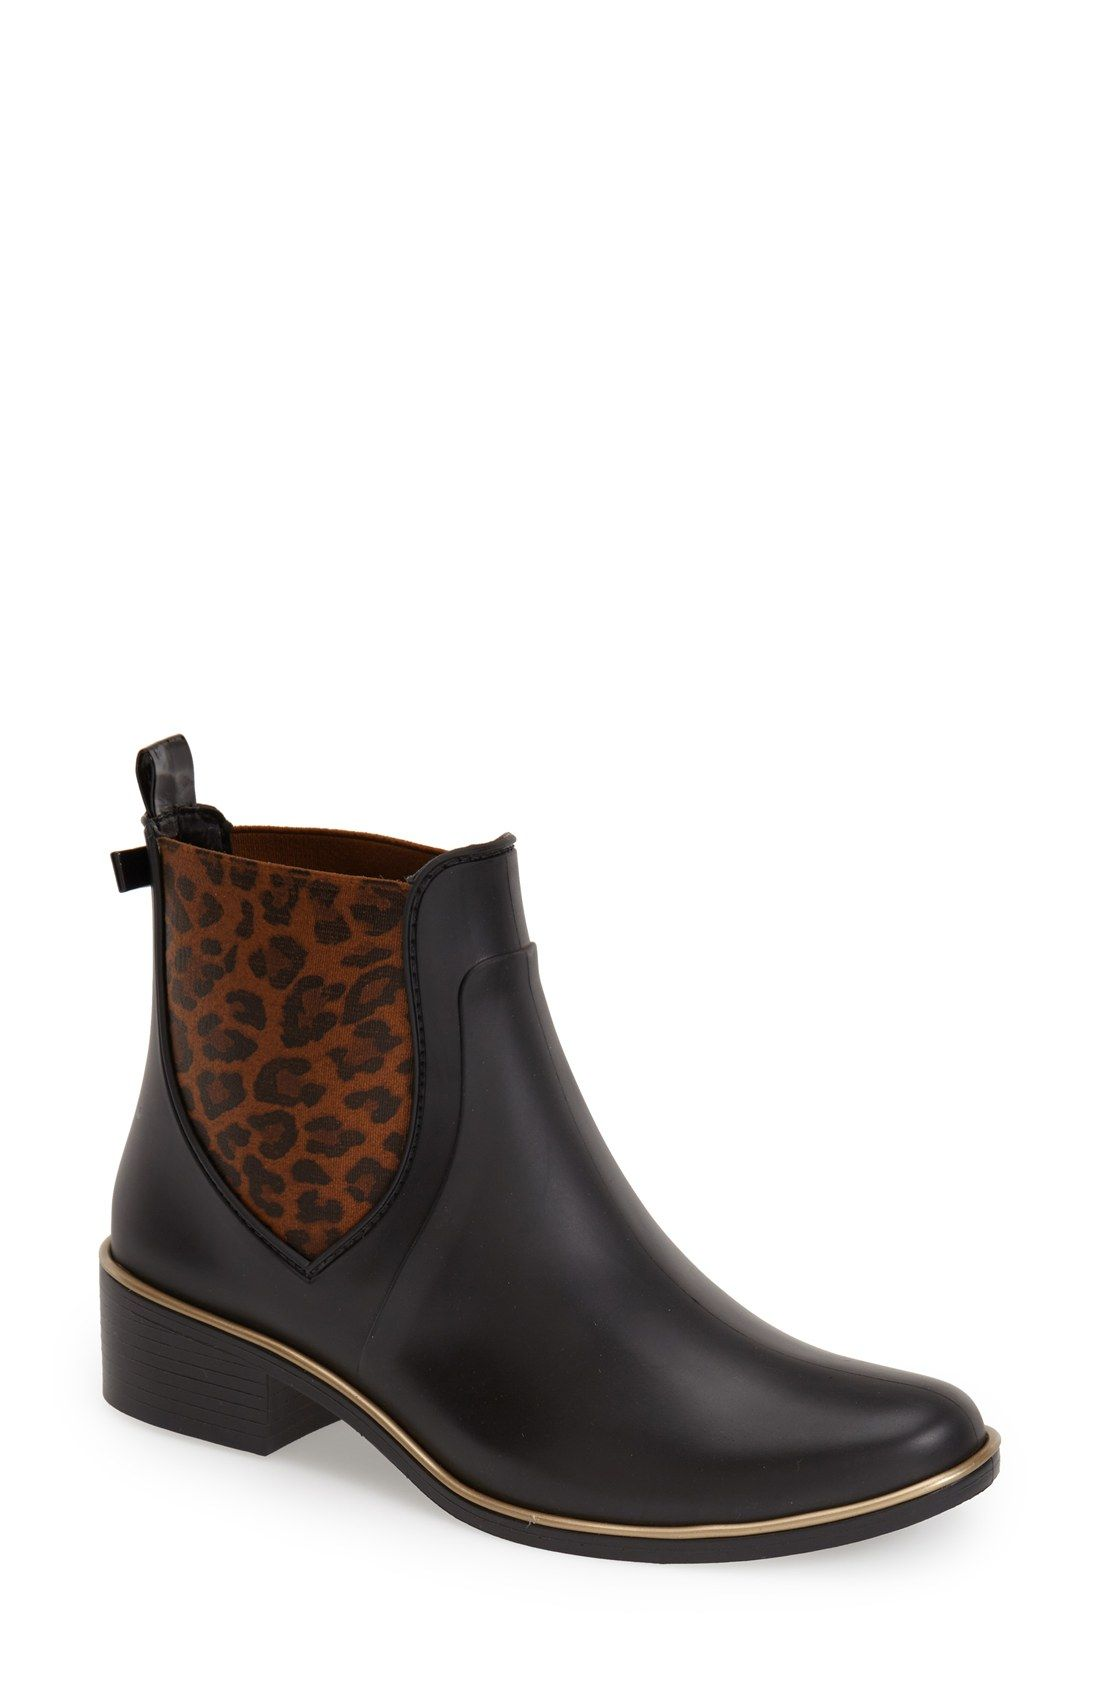 Kate Spade New York Sedgewick Rubber Rain Boot Women -1377